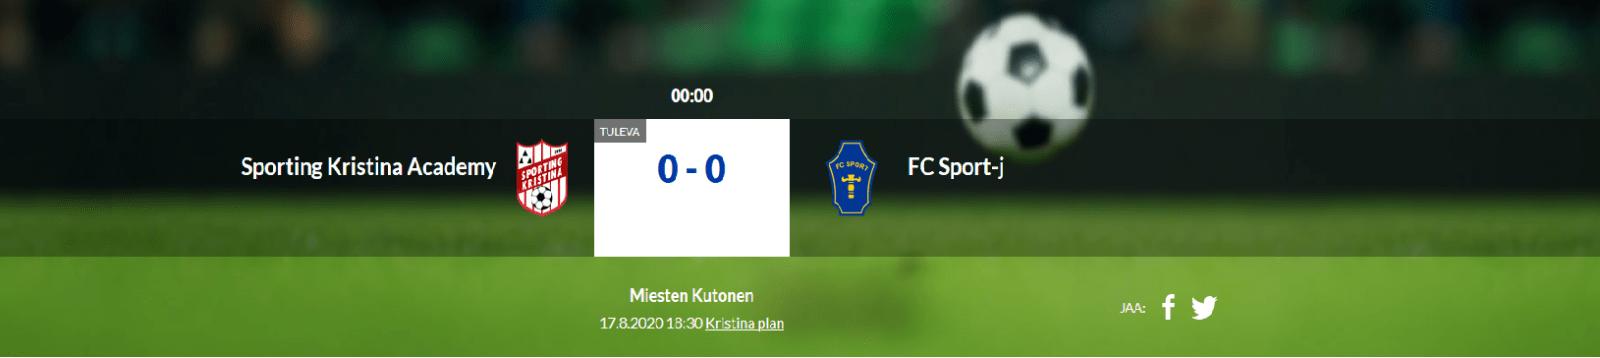 Sporting Kristina Academy – FC Sport-j 17.8.2020 kl.18.30